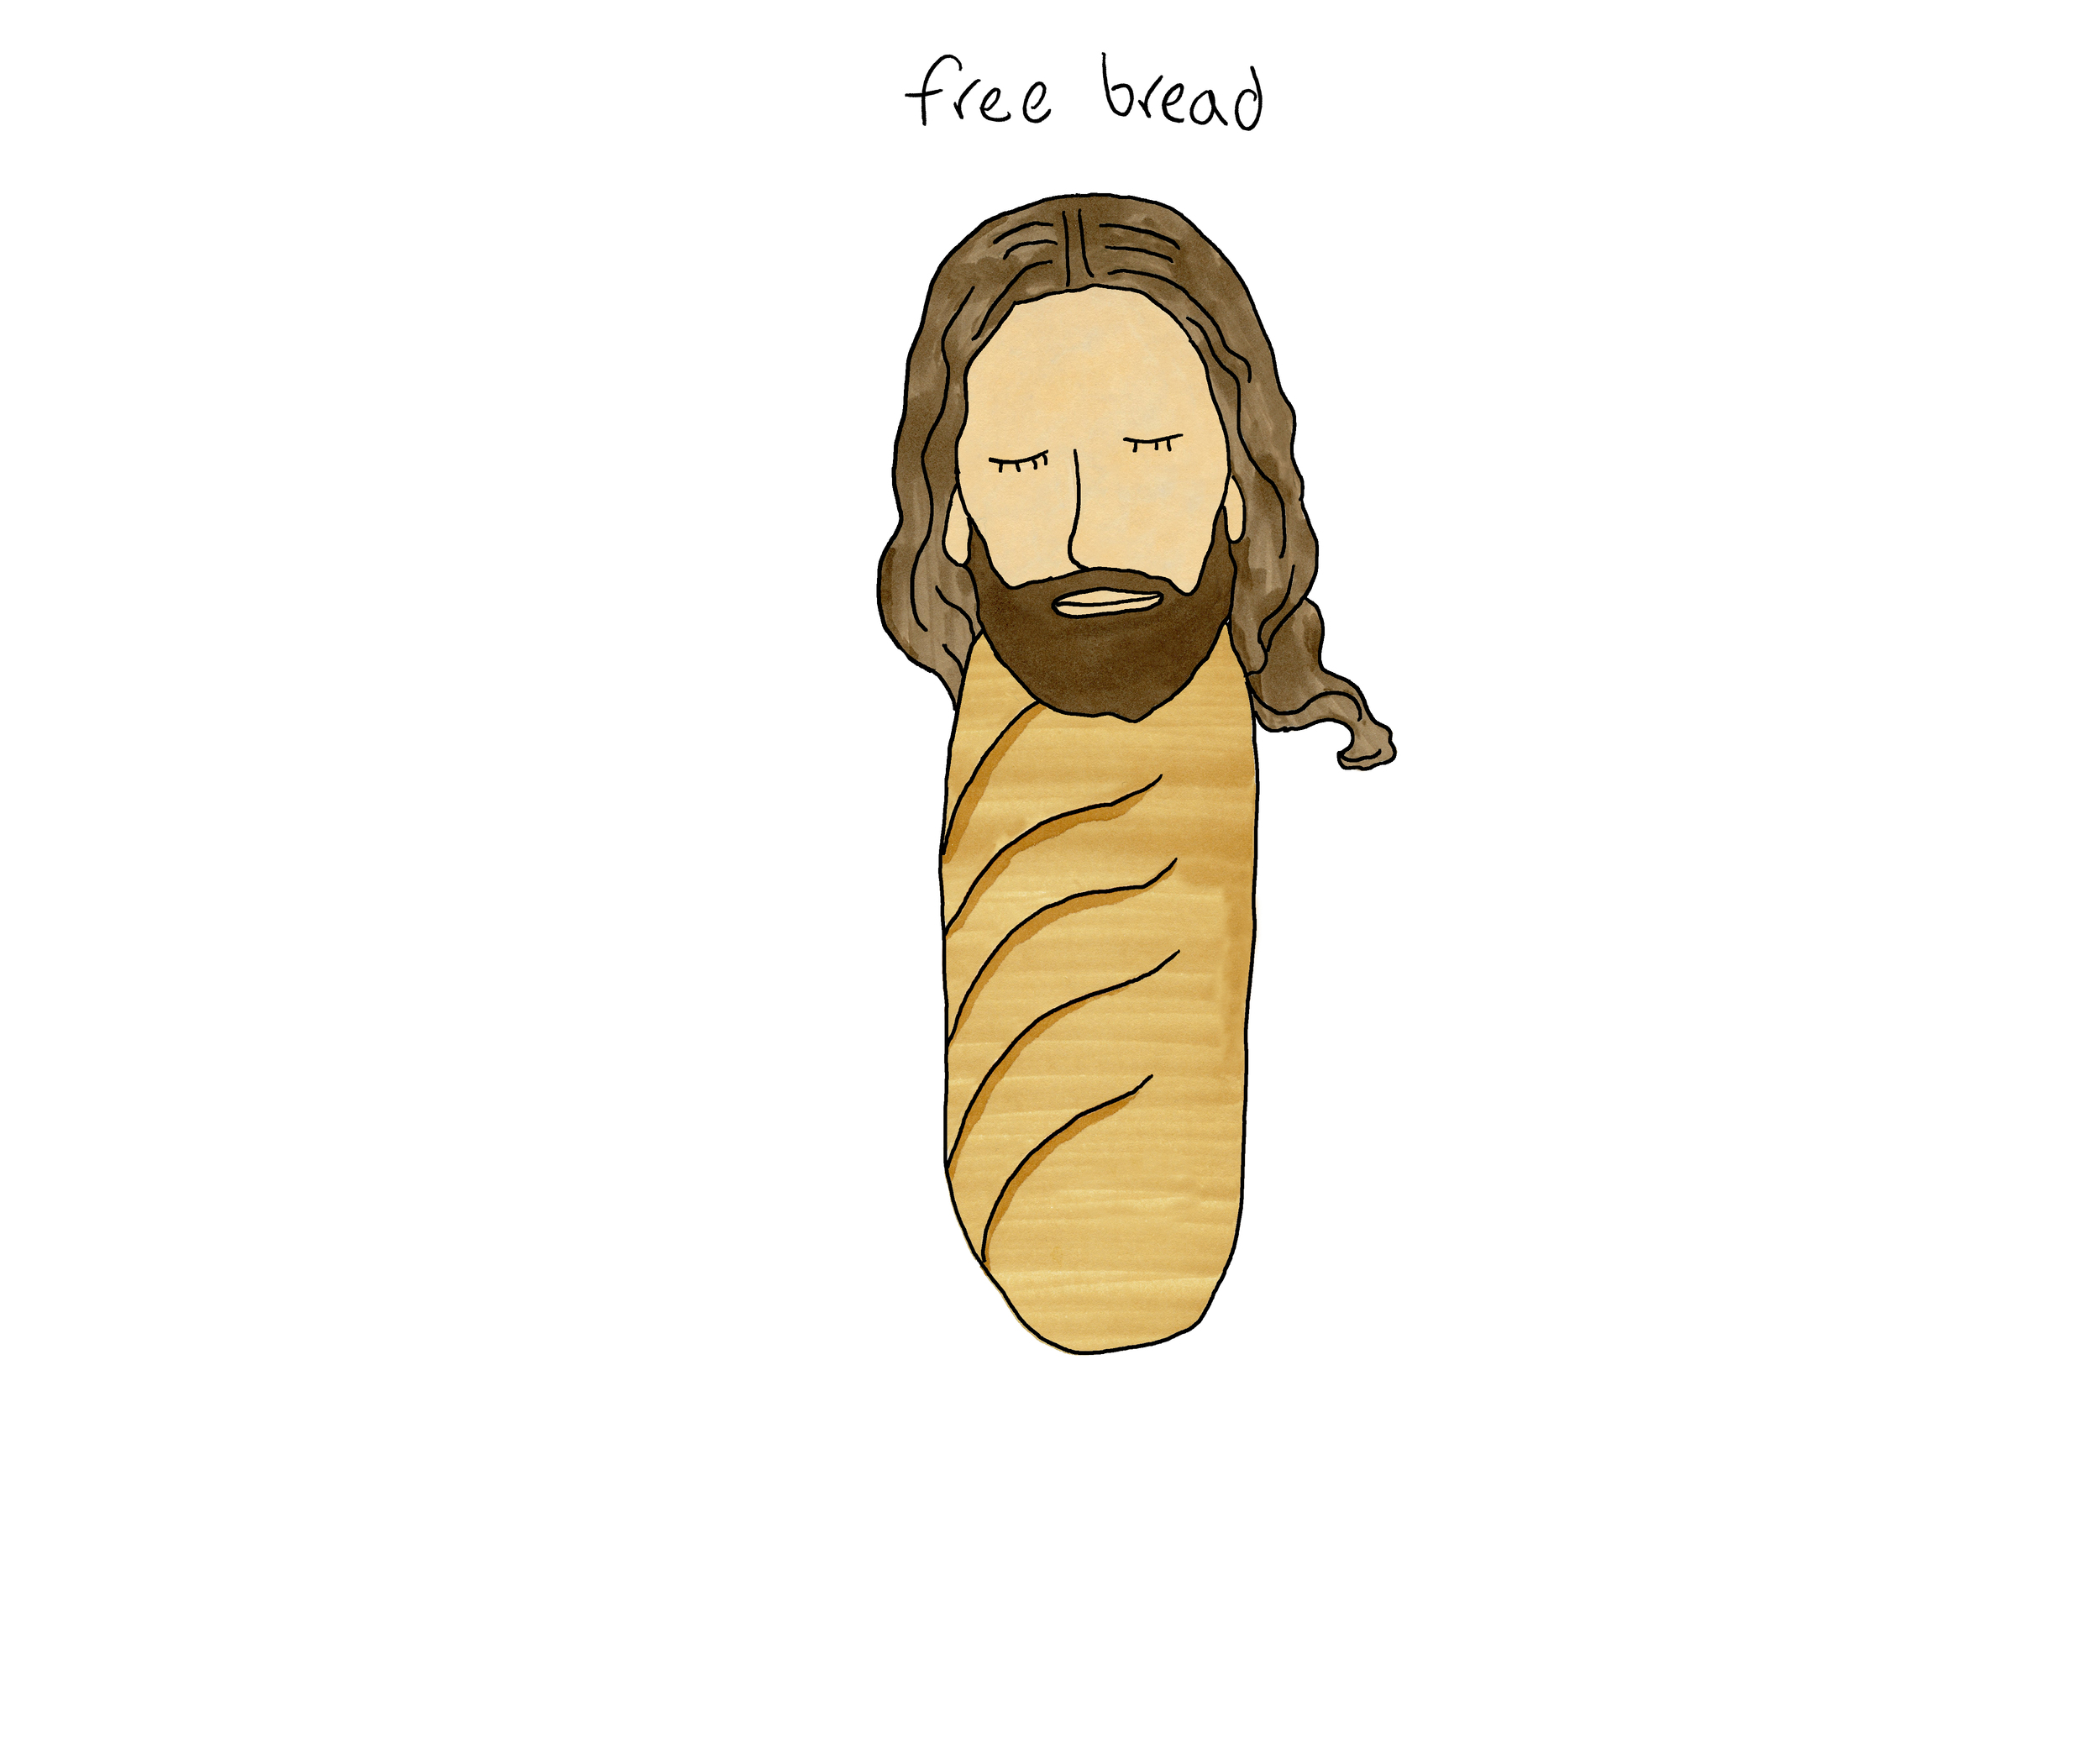 Free Bread.jpg